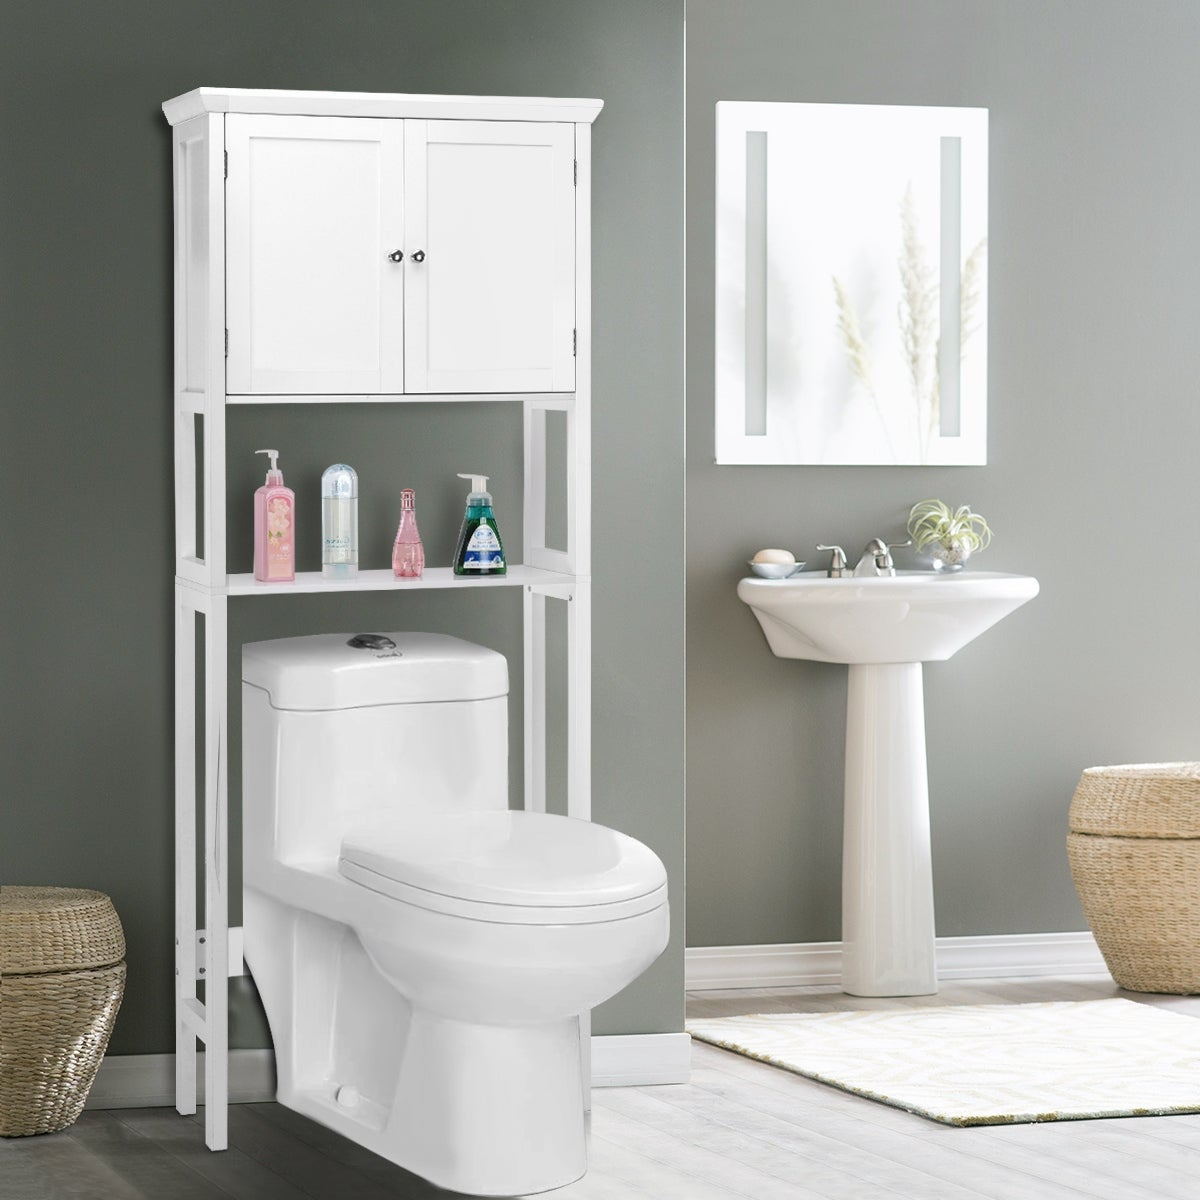 Shop Costway Toilet Storage Space Saver Towel Rack Shelf Cabinet ...